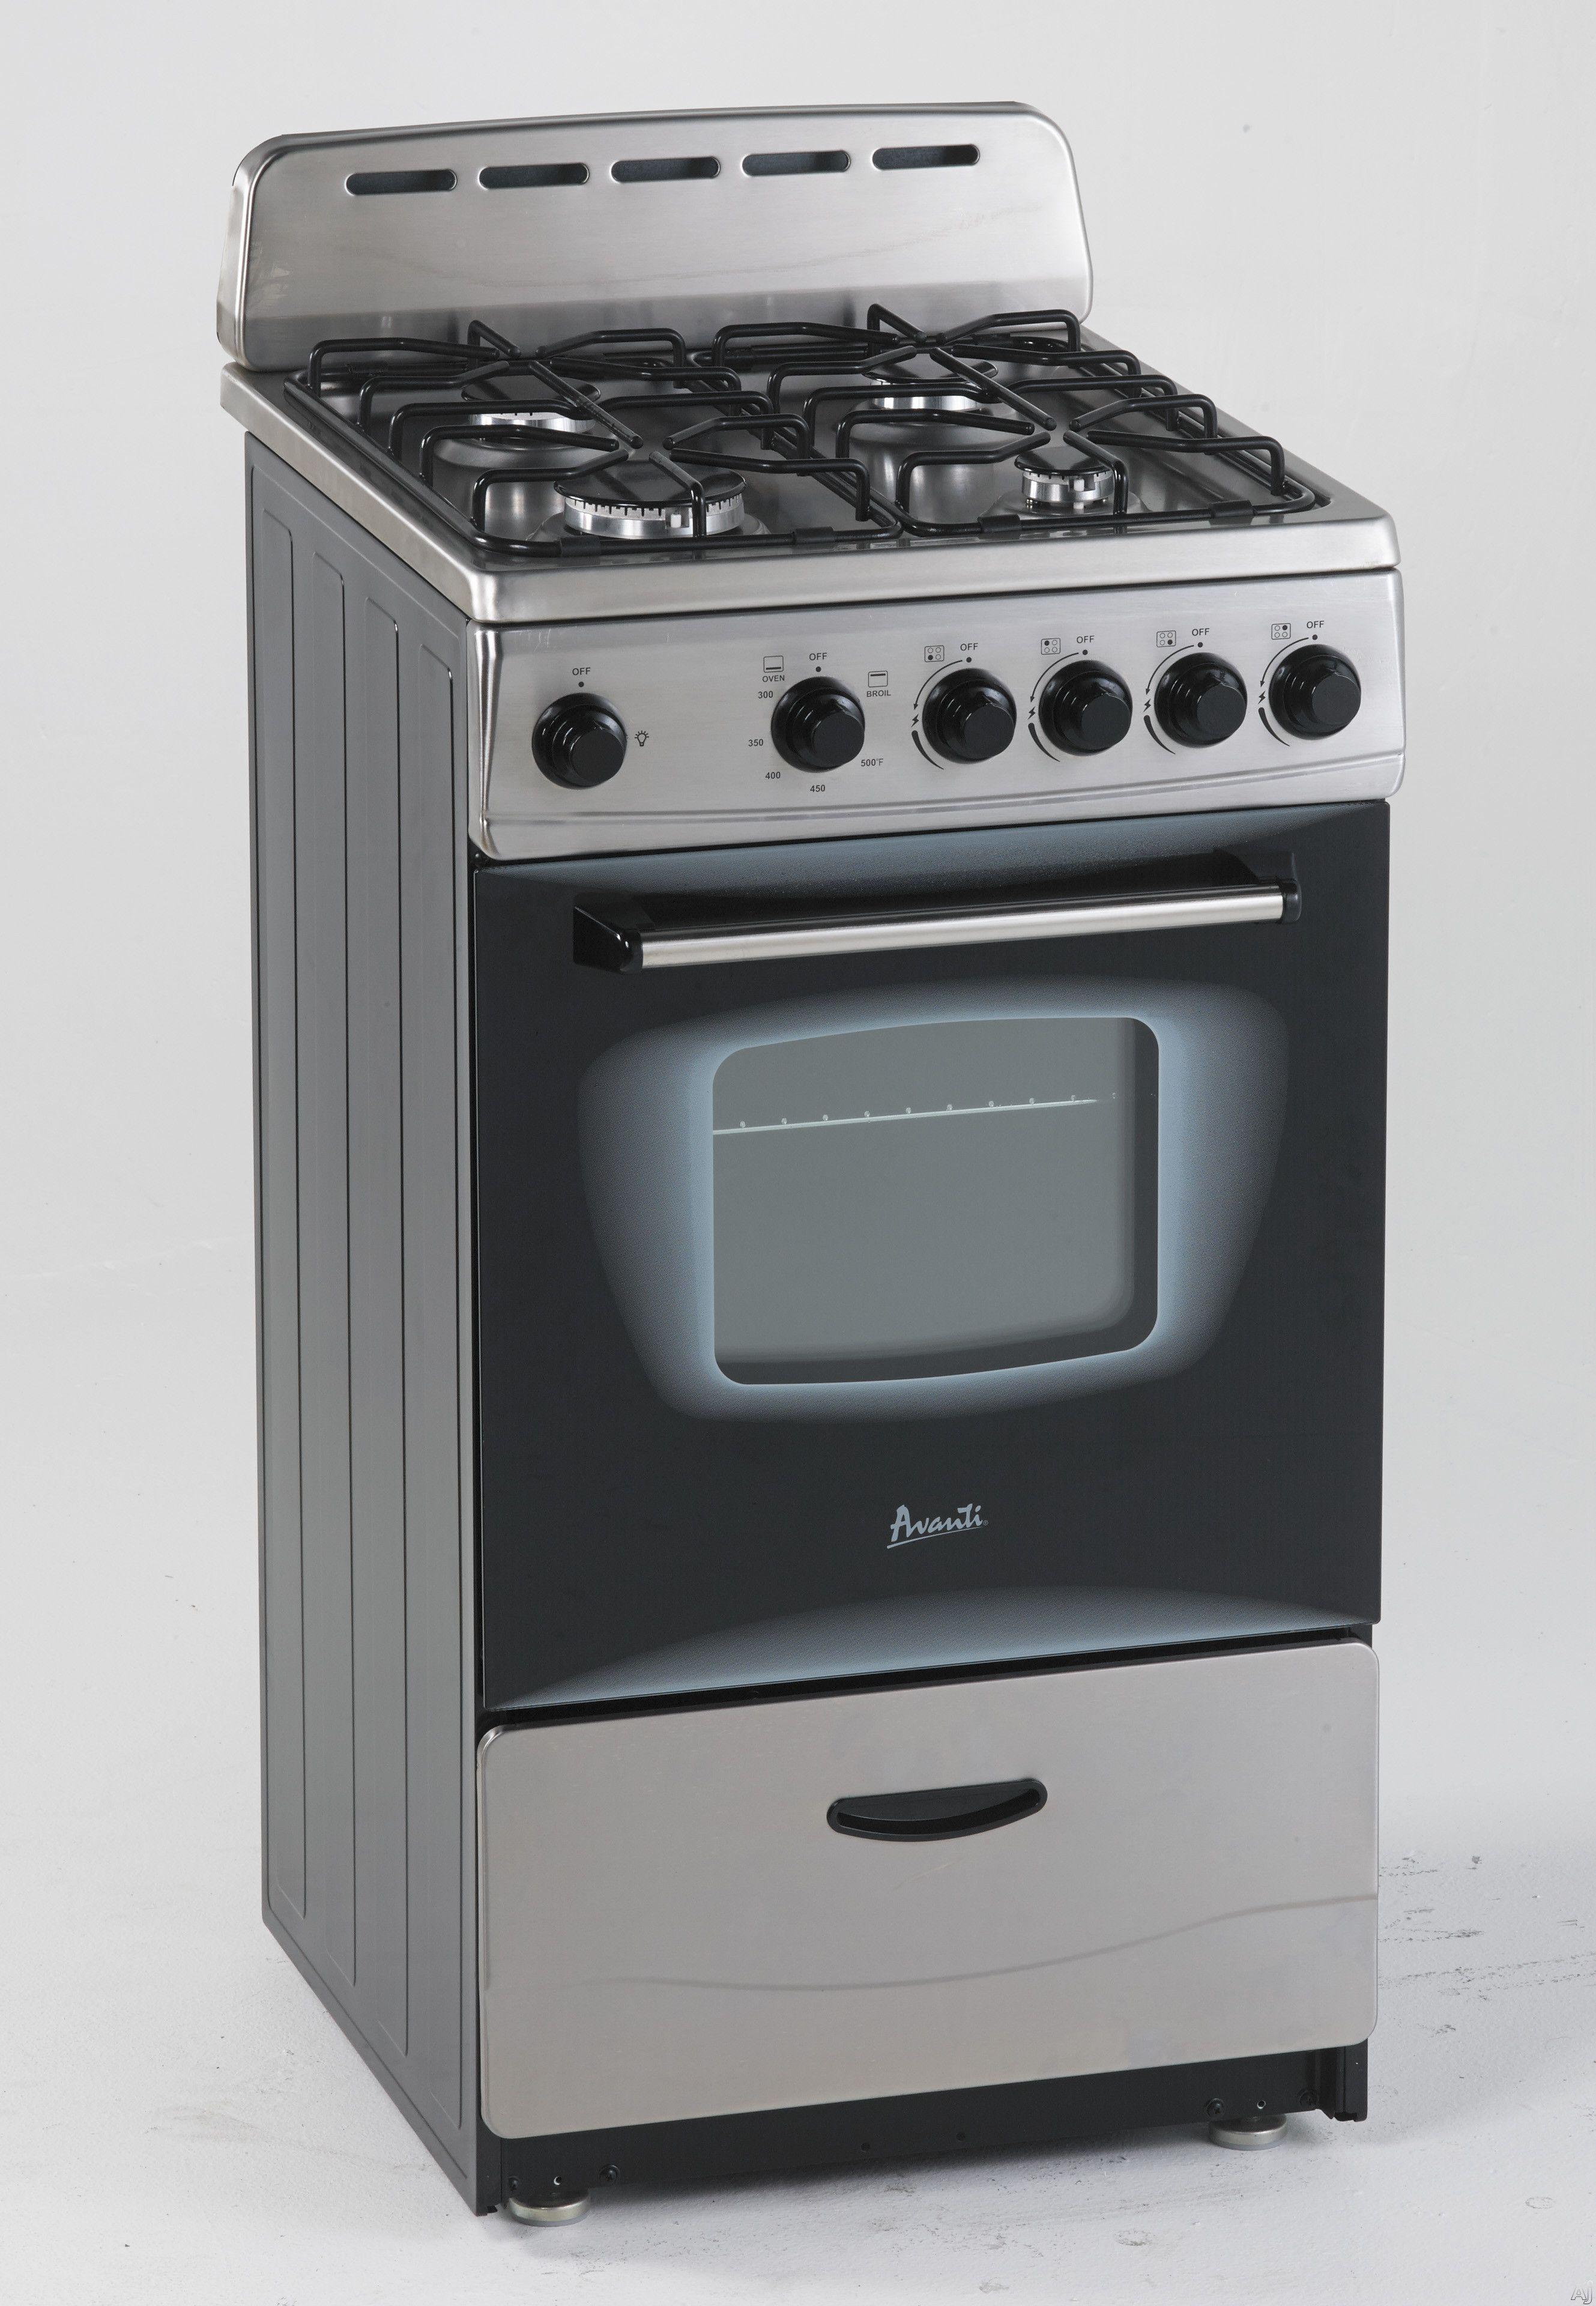 Avanti Gr20x 20 Freestanding Gas Range With 4 Sealed Burners Waist High Broiler Backsplash Lp Conversion Kit And Storage Drawer